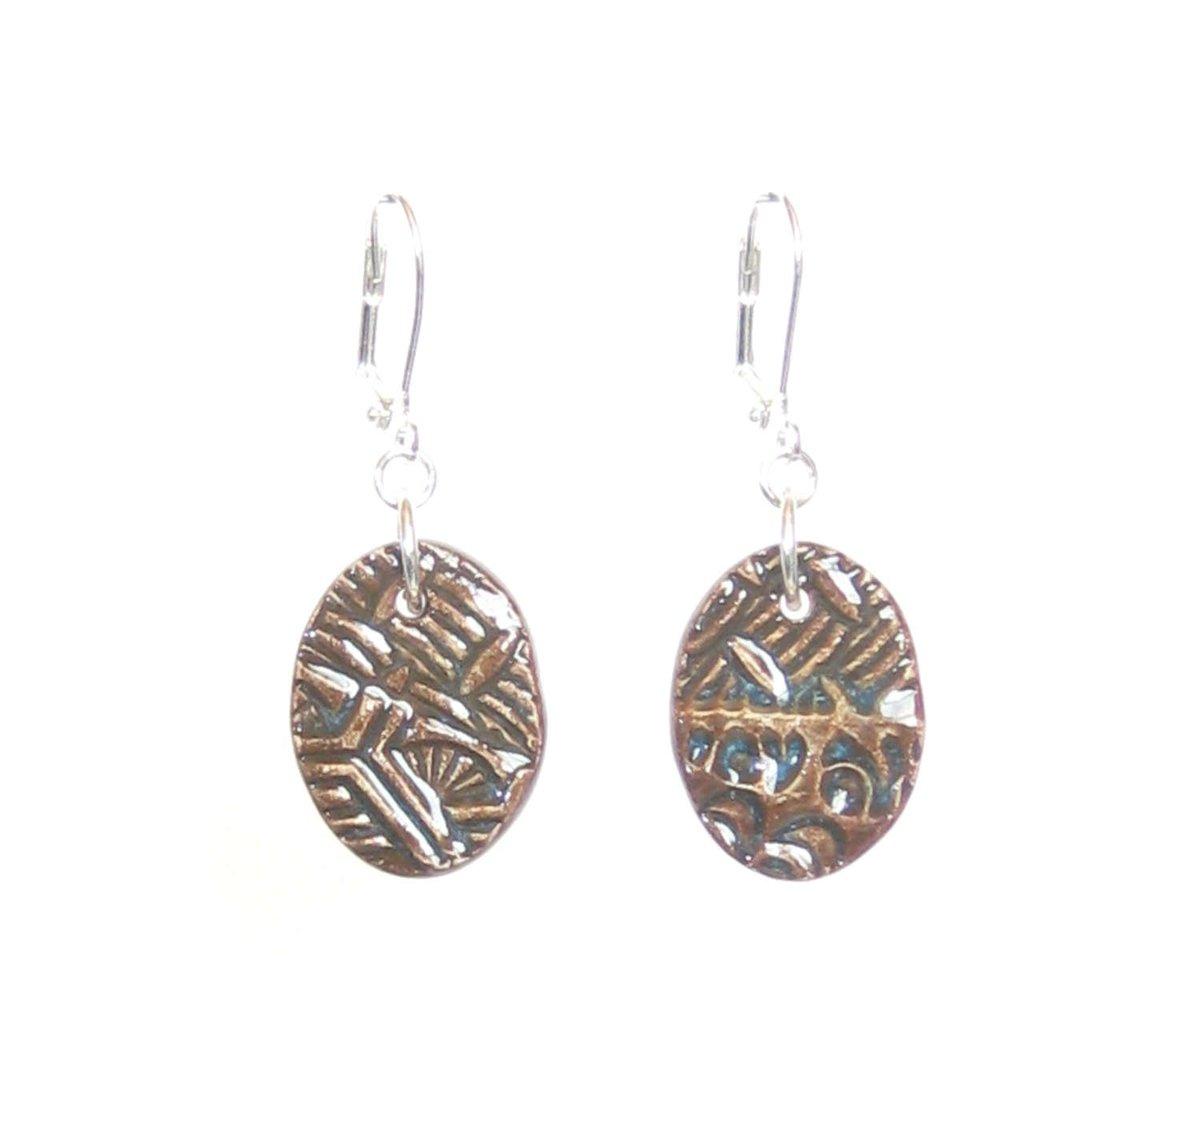 Rustic Dark Brown Ceramic Oval Earrings , Sterling Silver Leverbacks,…  http:// tuppu.net/96df0cde  &nbsp;   #etsymntt #epiconetsy <br>http://pic.twitter.com/HRYHHUTLOJ